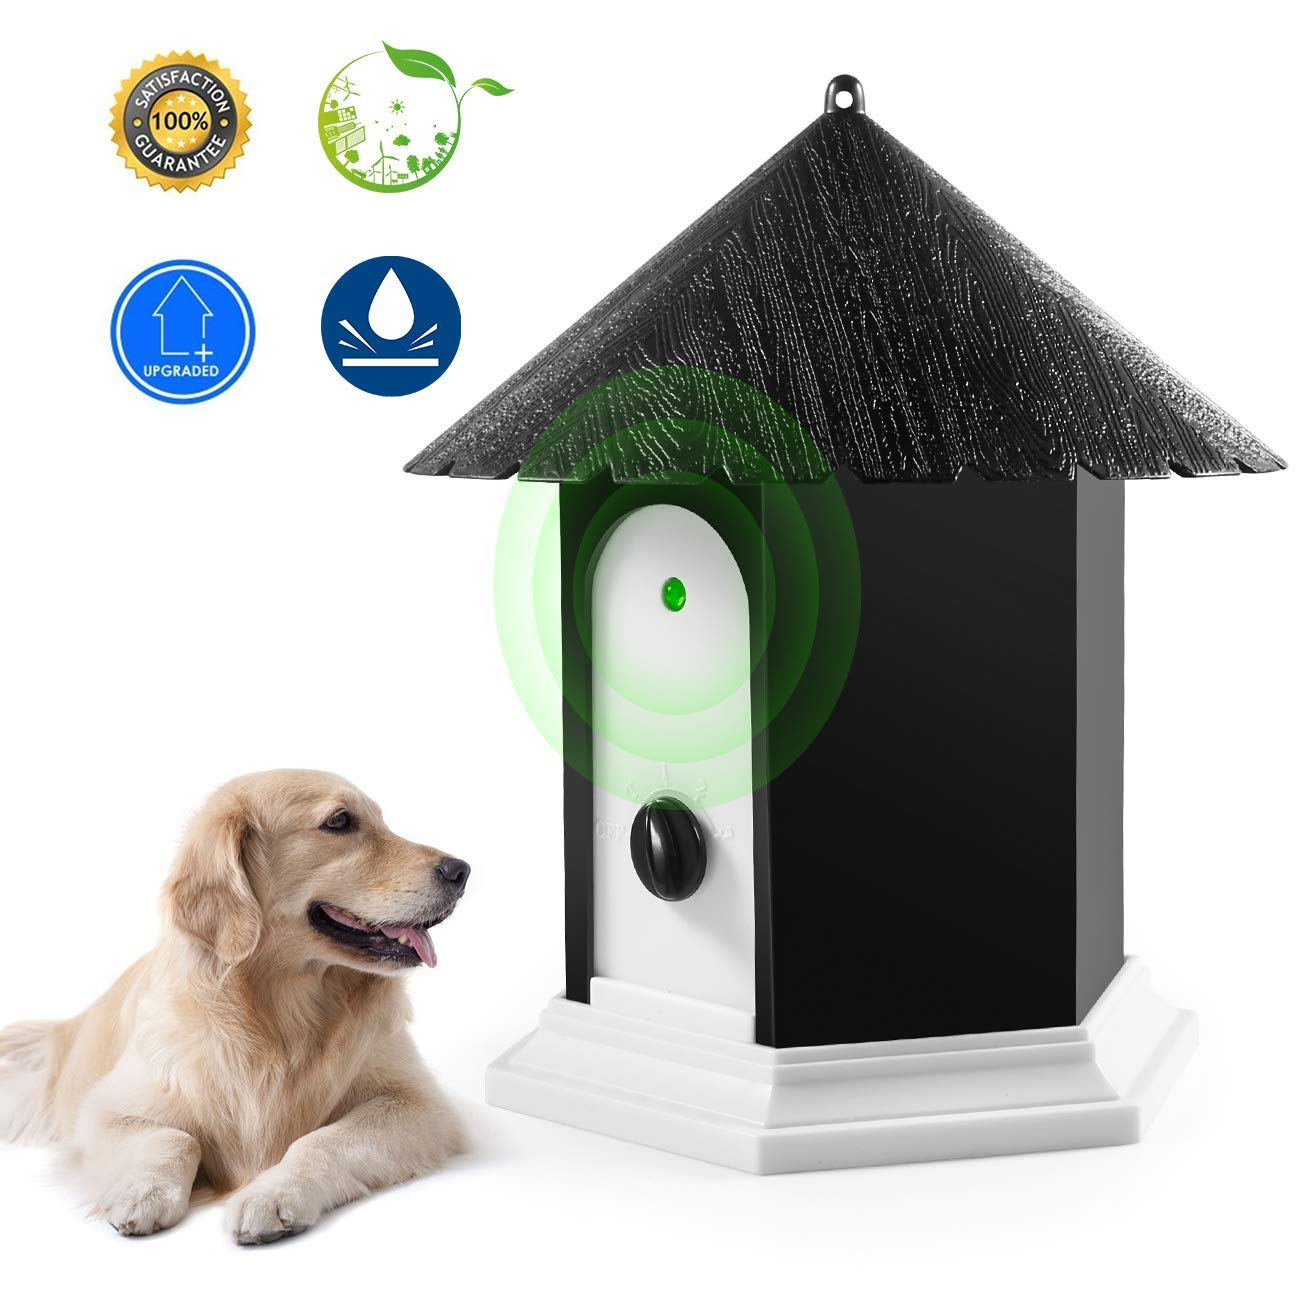 PET CAREE Ultrasonic Dog Bark Controller